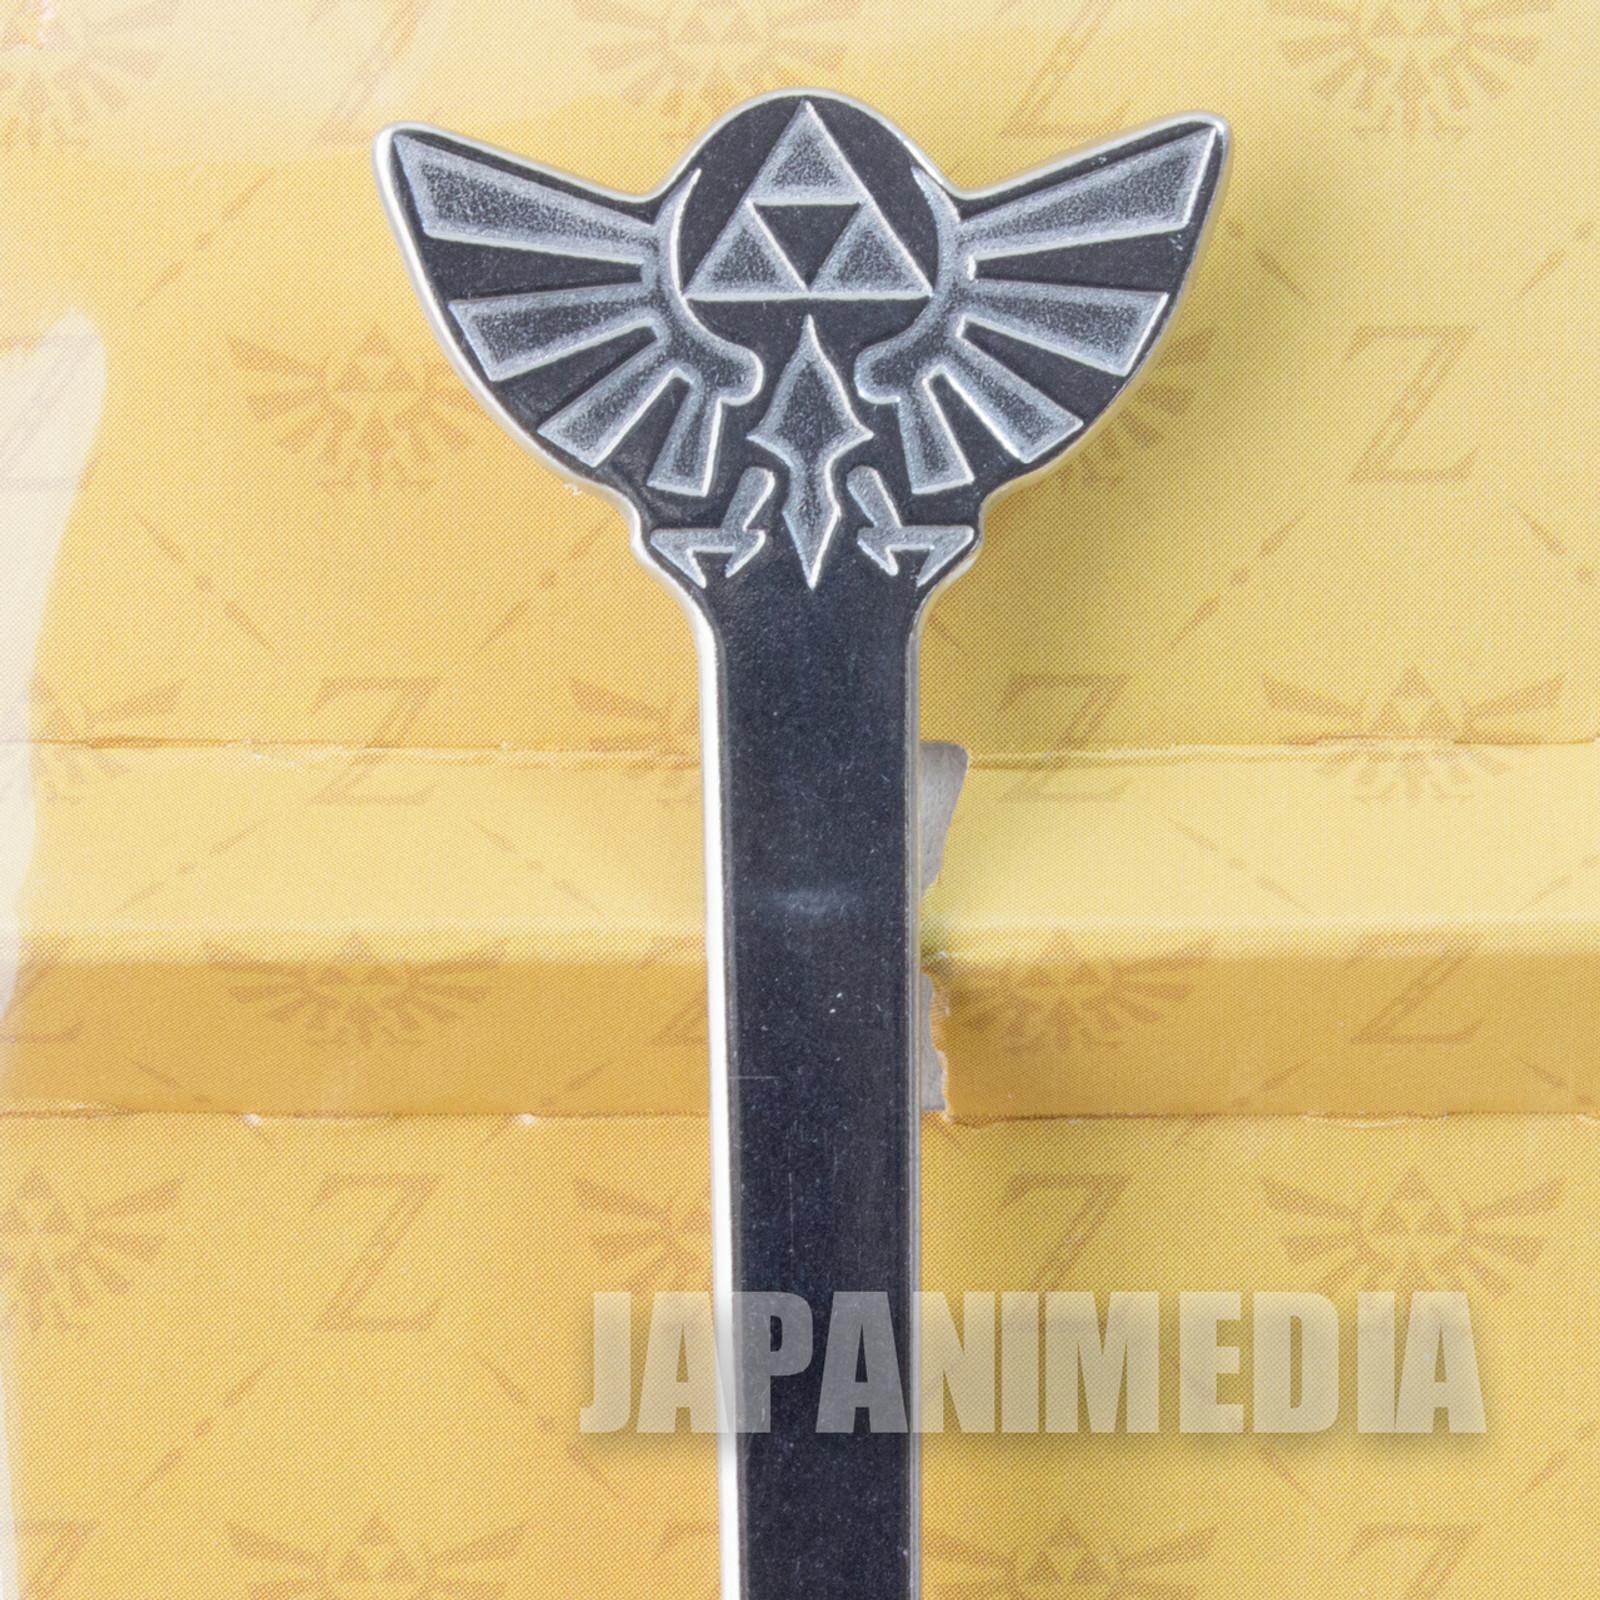 The Legend of Zelda Hyrule Emblem Spoon Symbol Cutlery Series Nintendo Banpresto